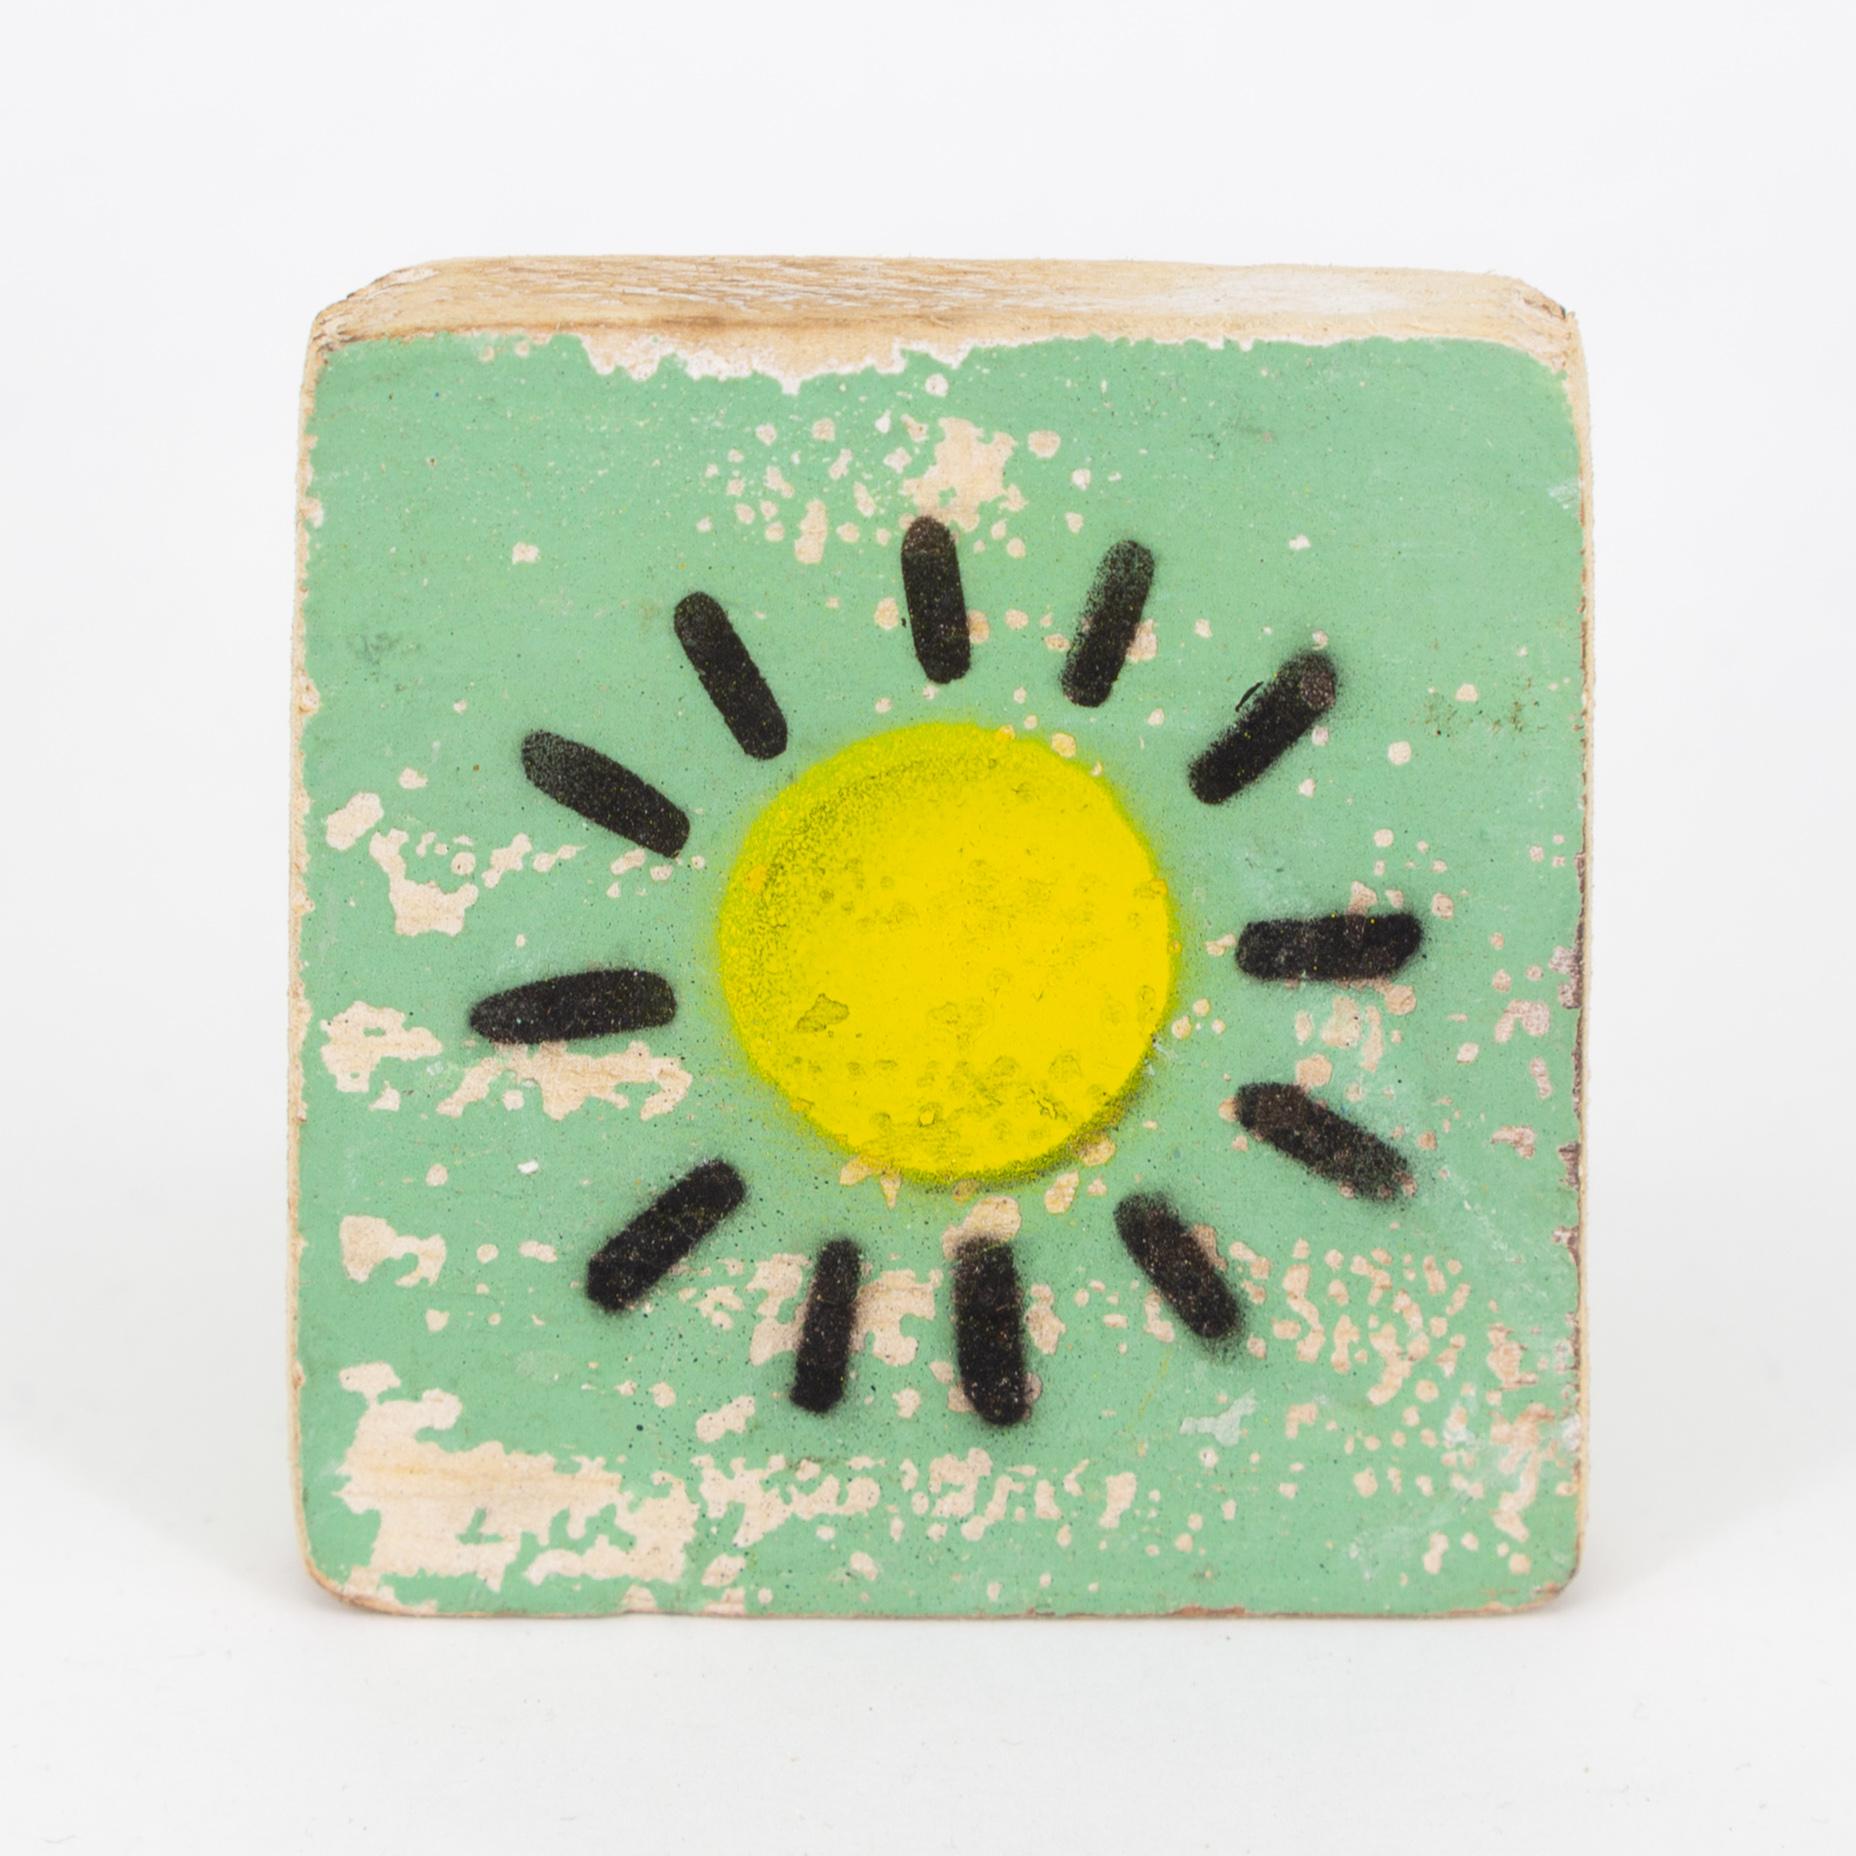 Holzsymbol - Sonne - im Scrabble-Style